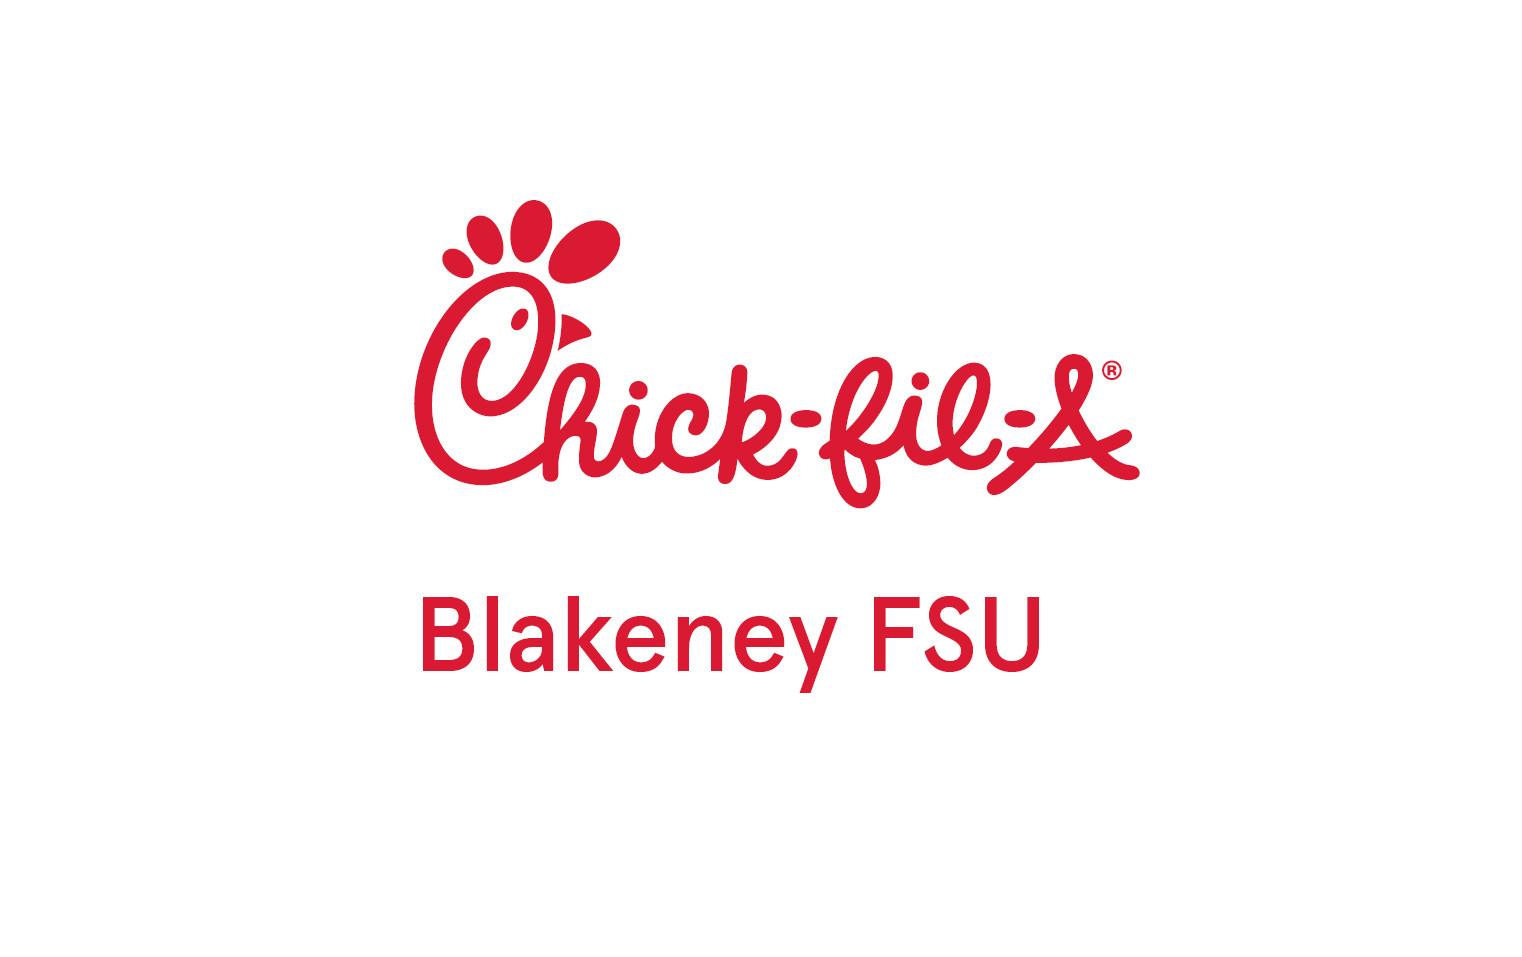 Chick-fil-A Blakeney